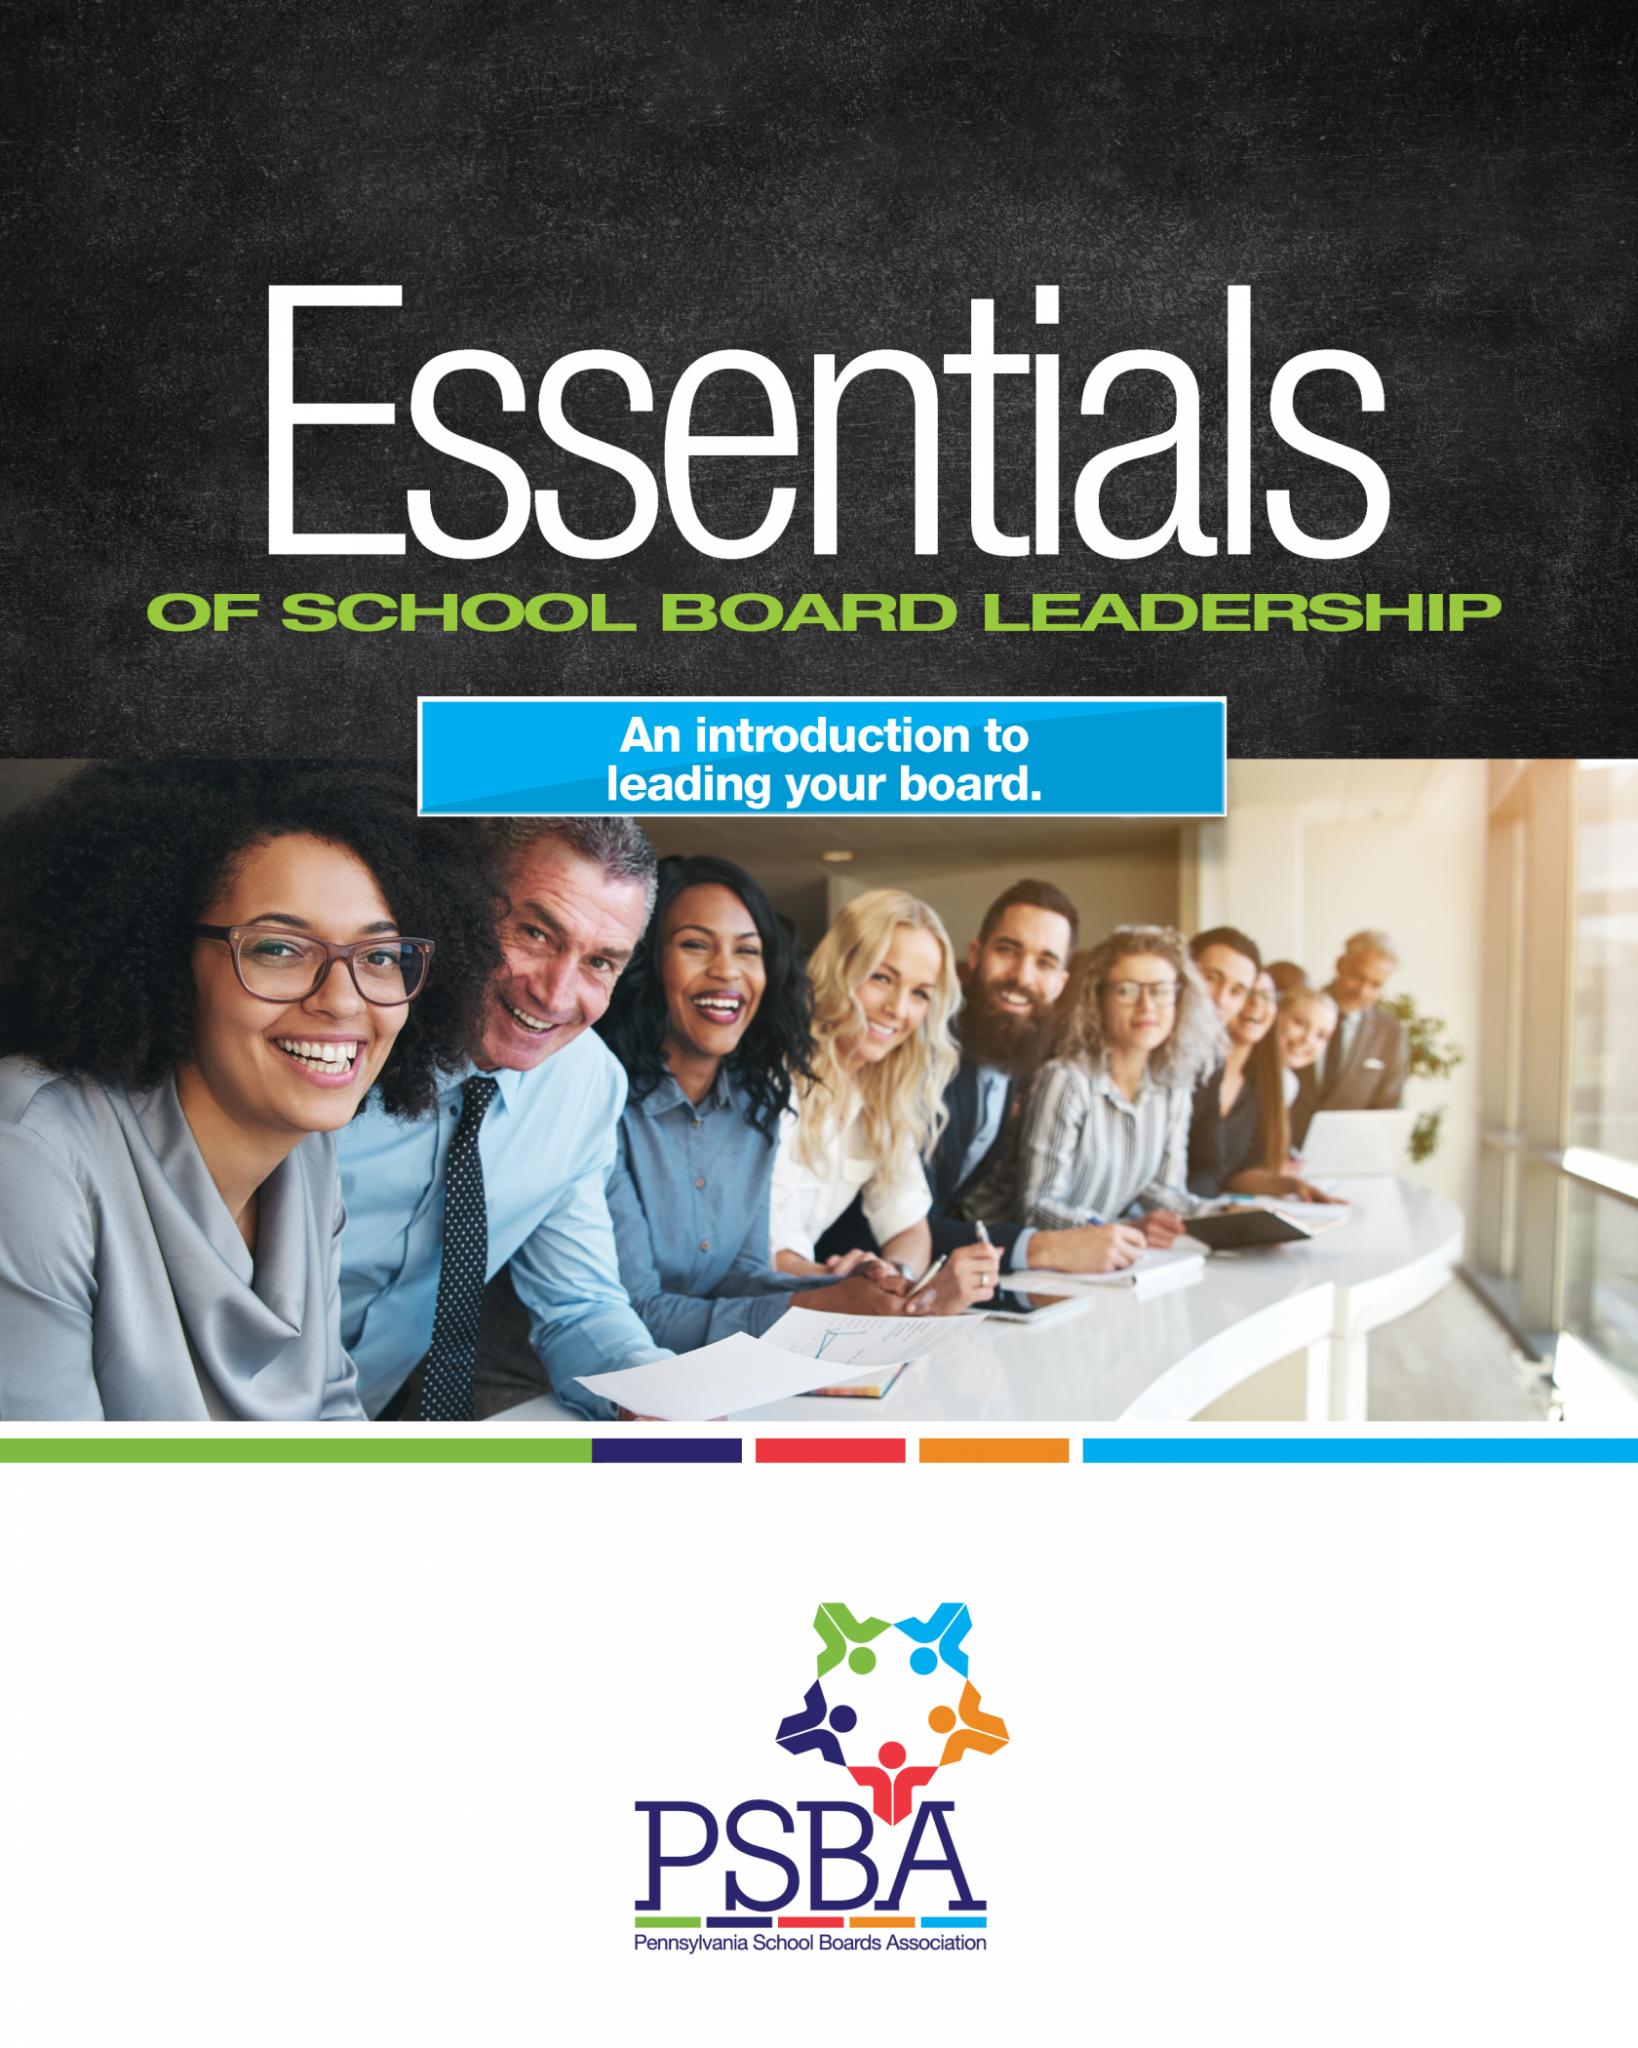 Essentials of School Board Leadership cover